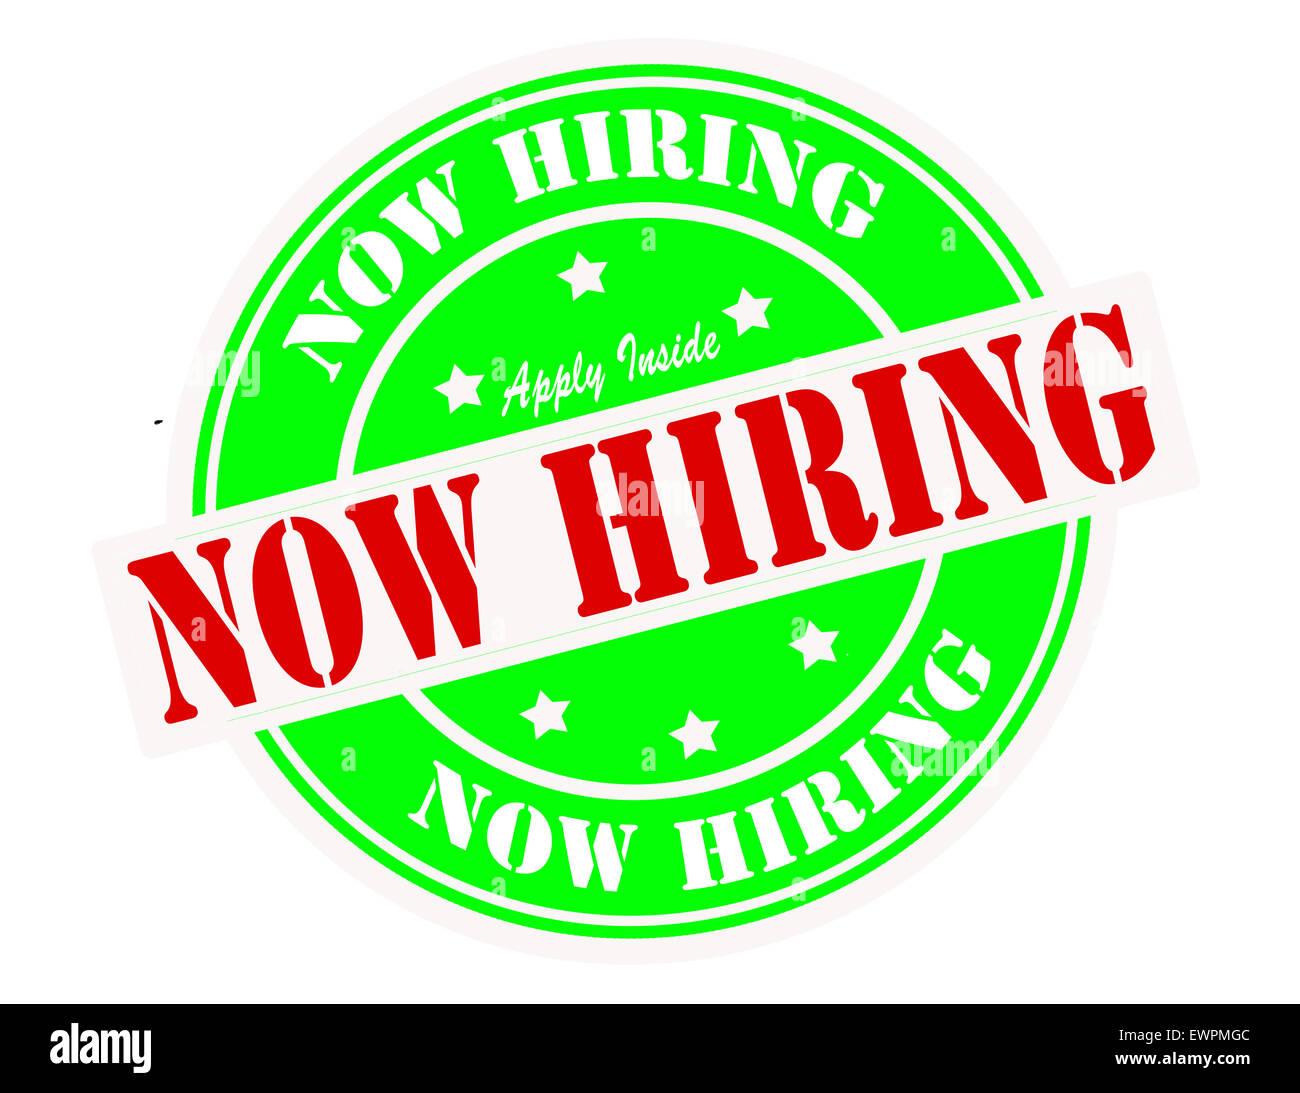 Ewp now hiring cover